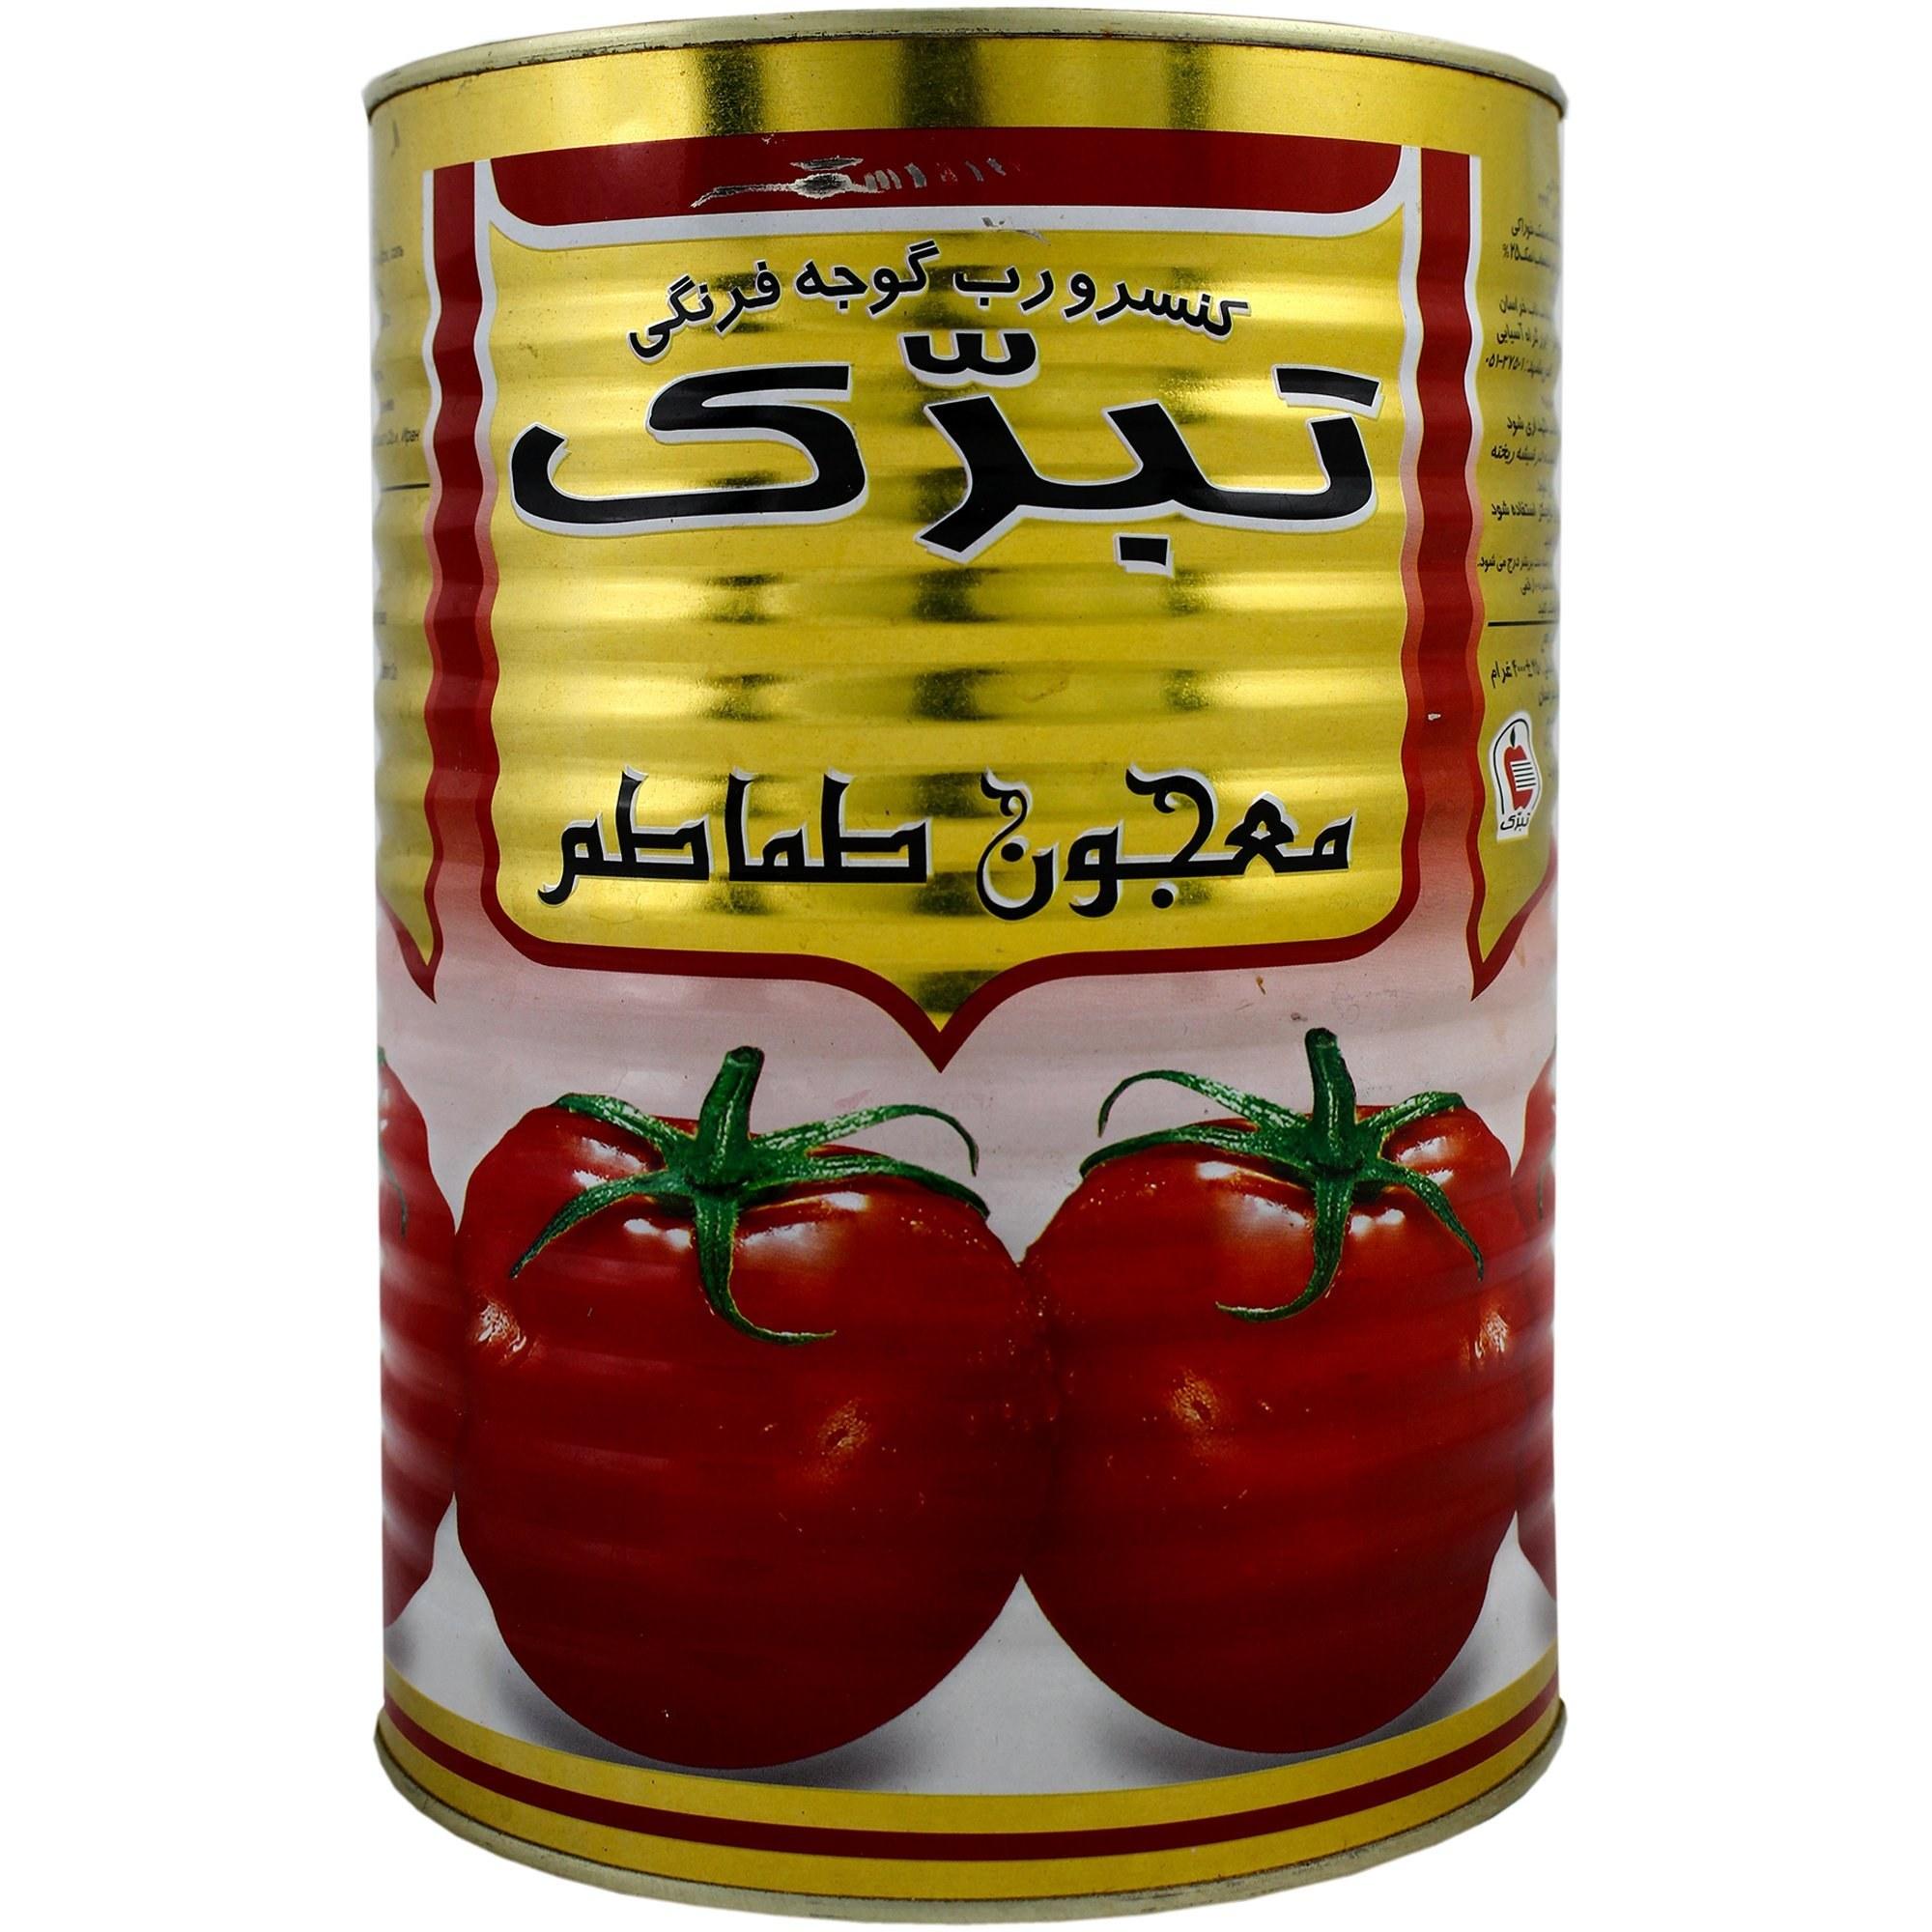 تصویر رب گوجه فرنگی تبرک 4 کیلوگرمی -